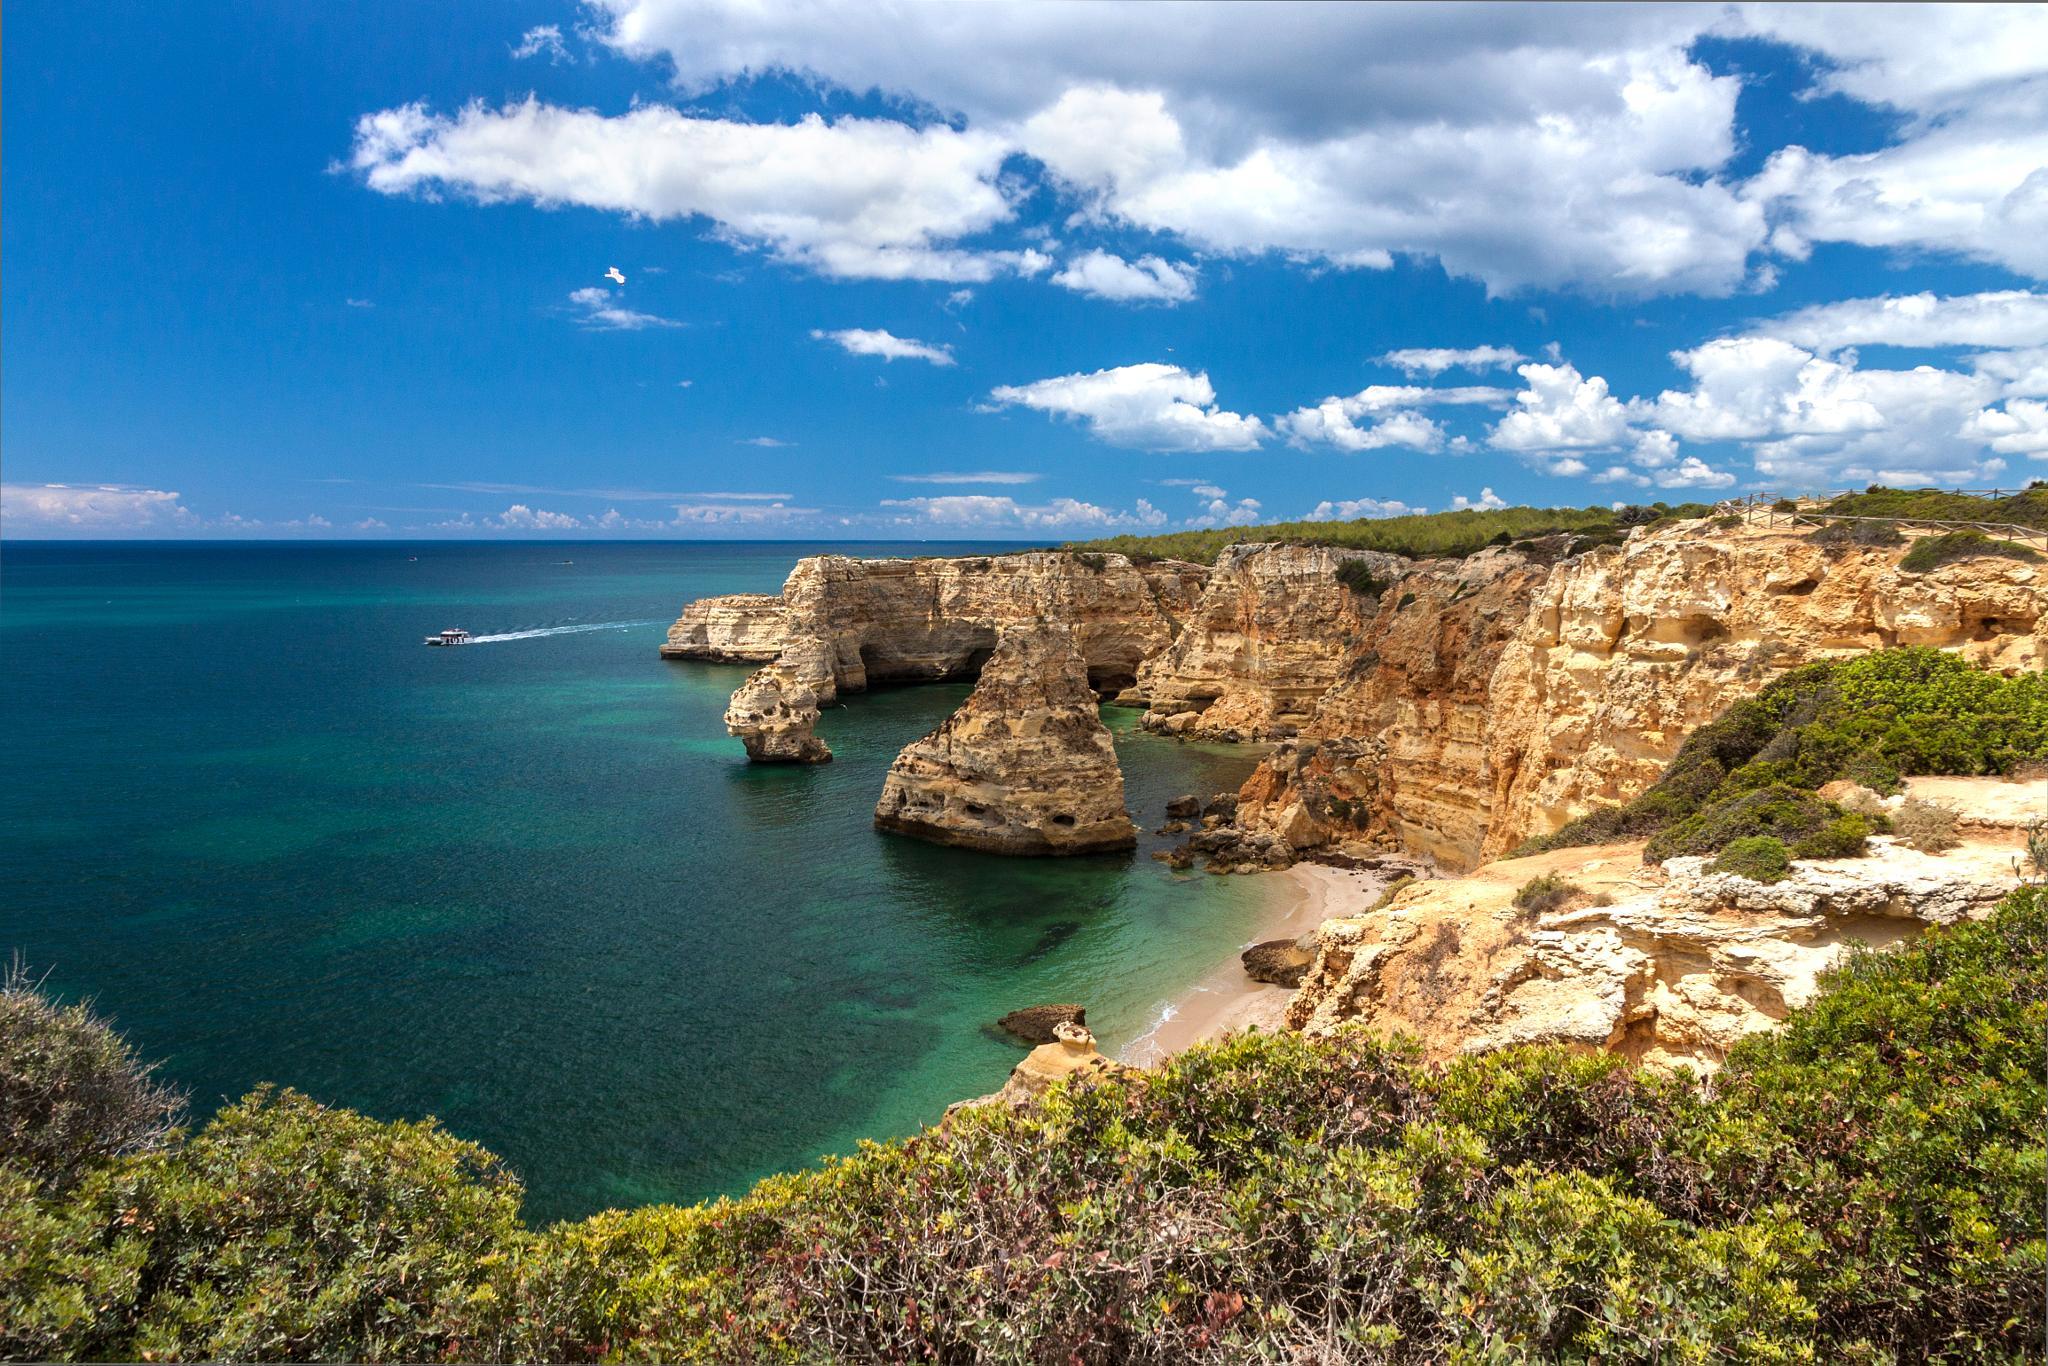 Algarve - Praia da Marinha by Alexander Friedrich